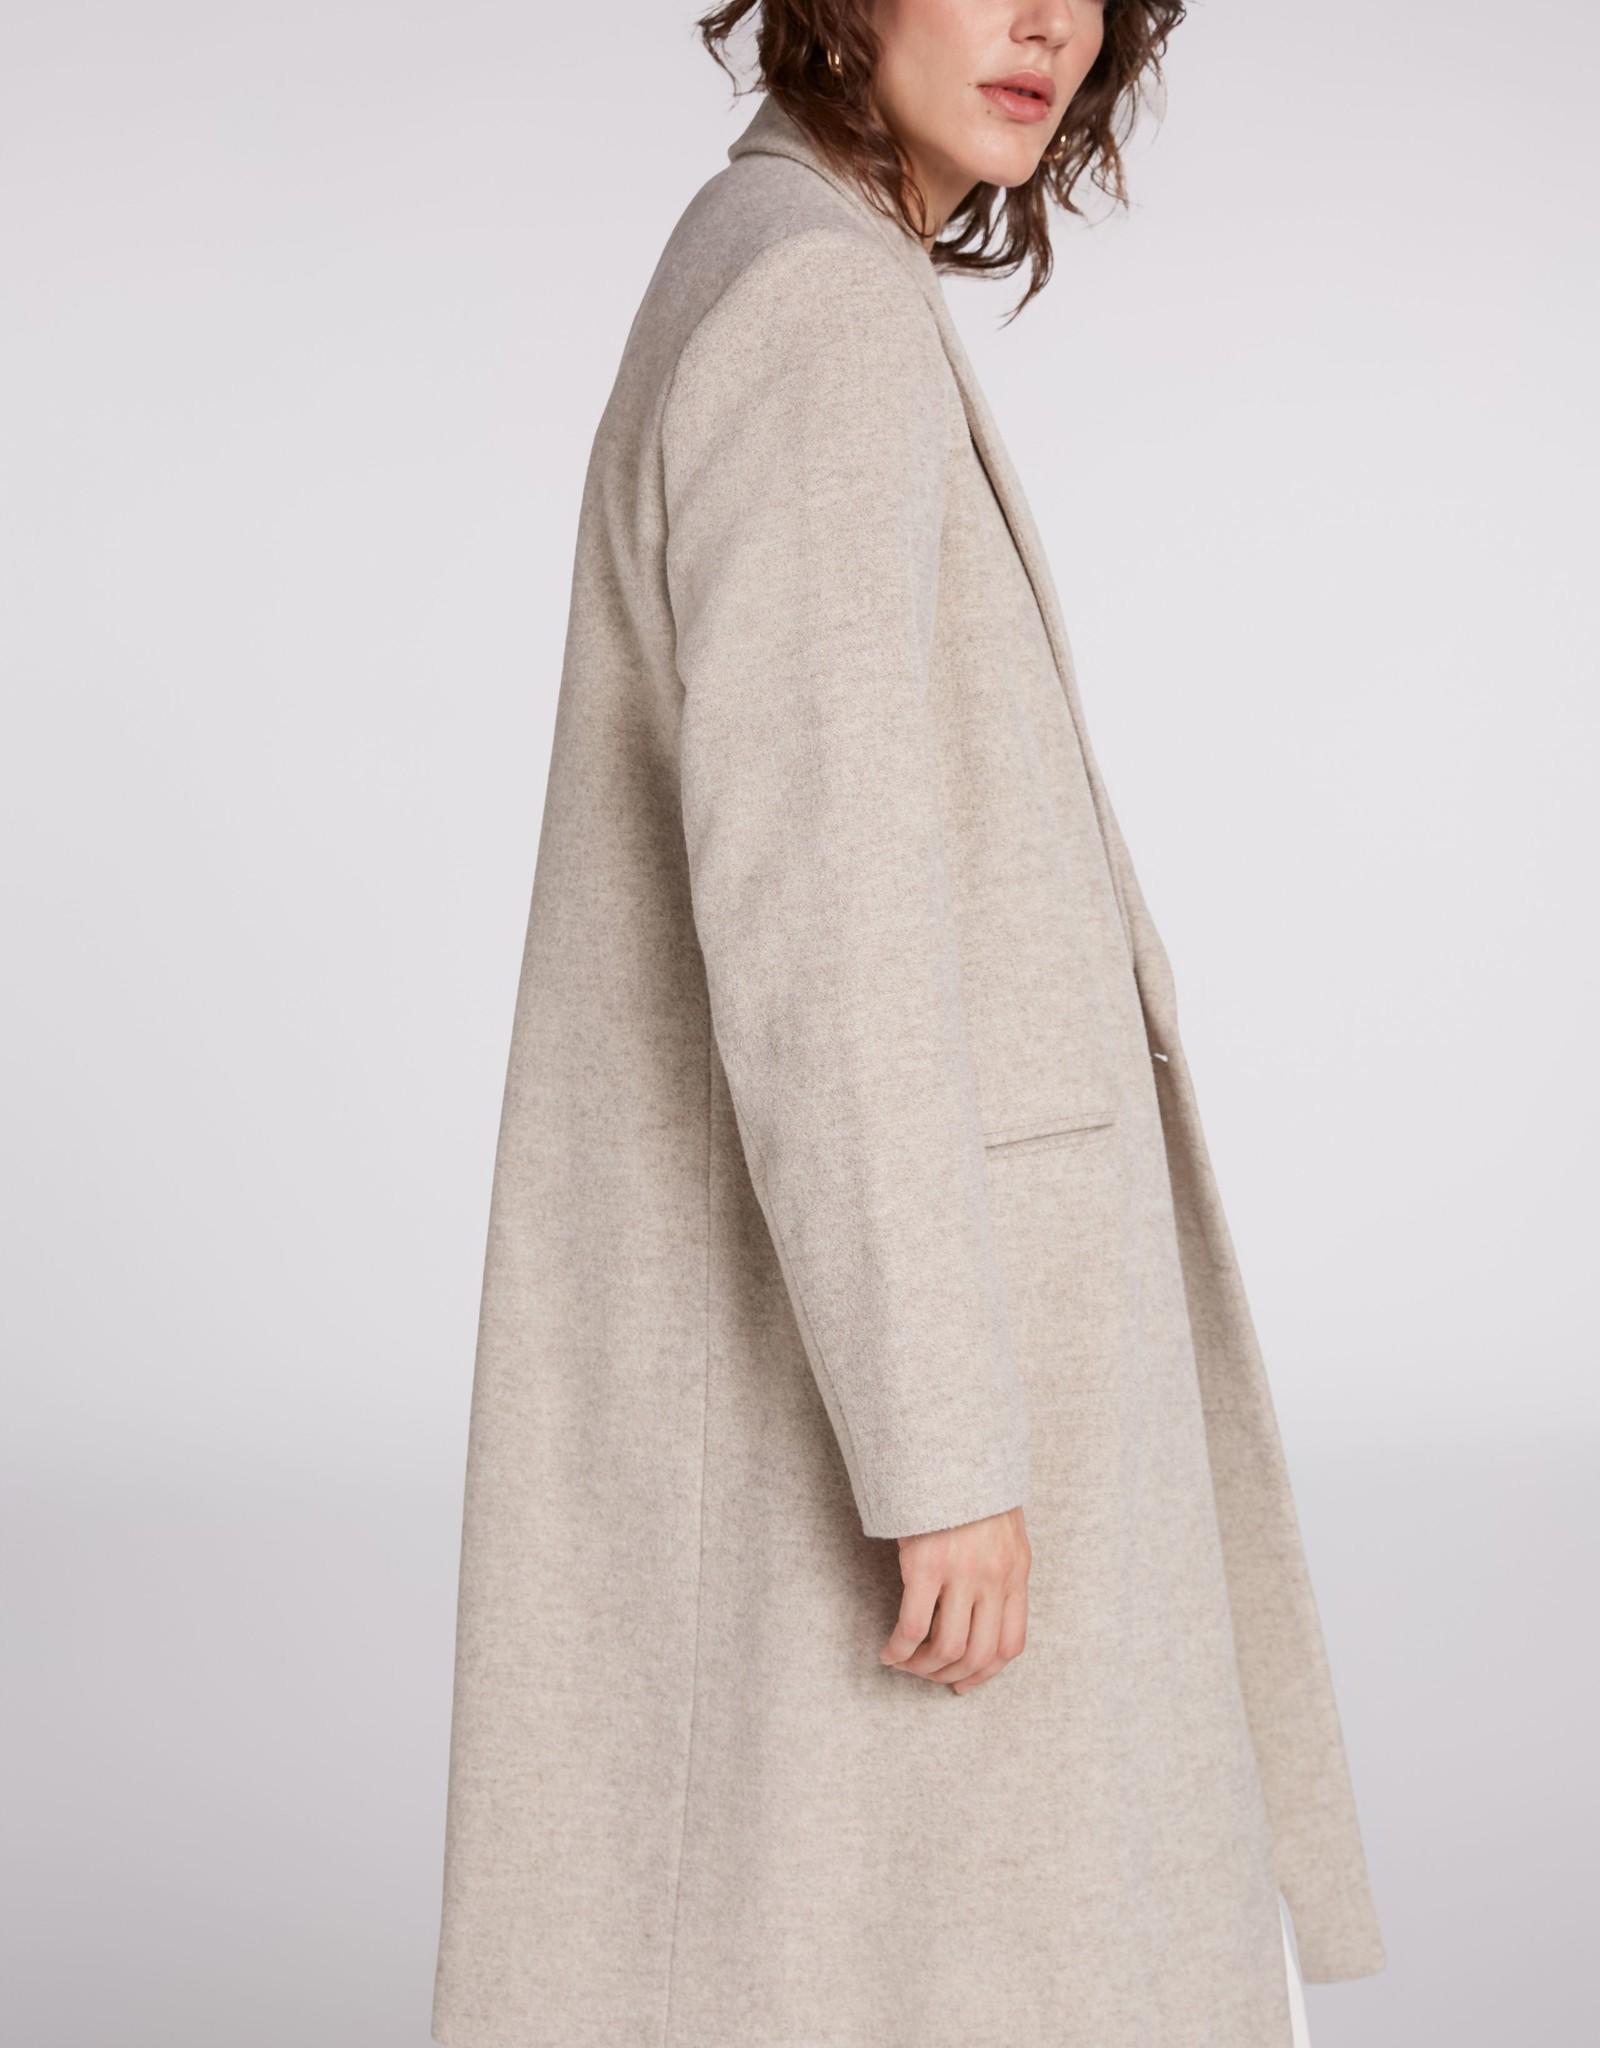 Ouí 74302 Coat